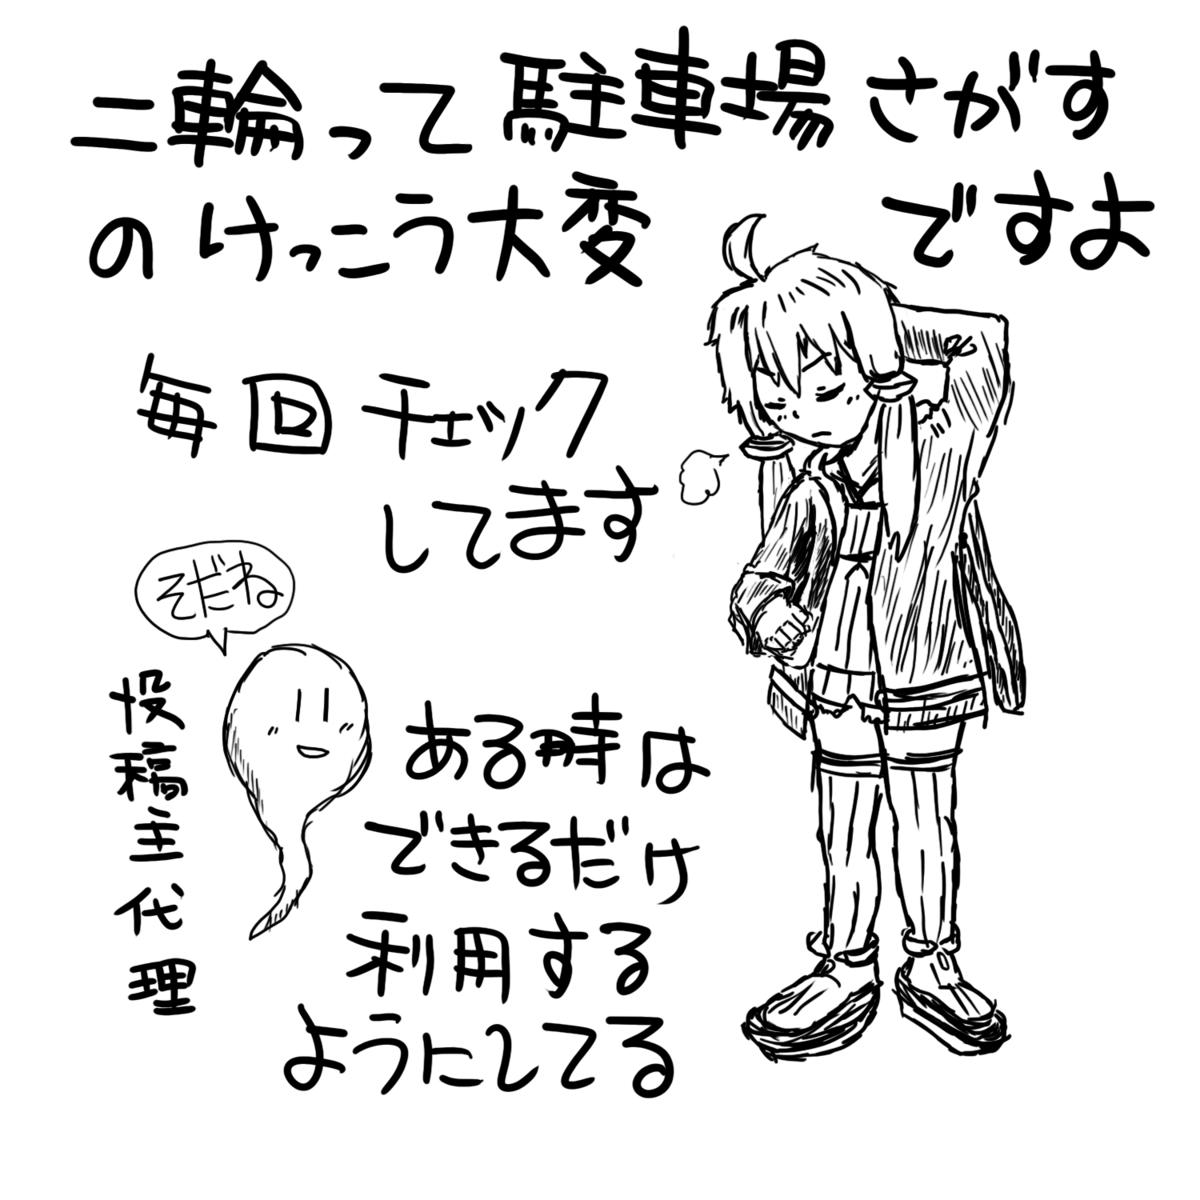 f:id:zomuzomu:20191014231712p:plain